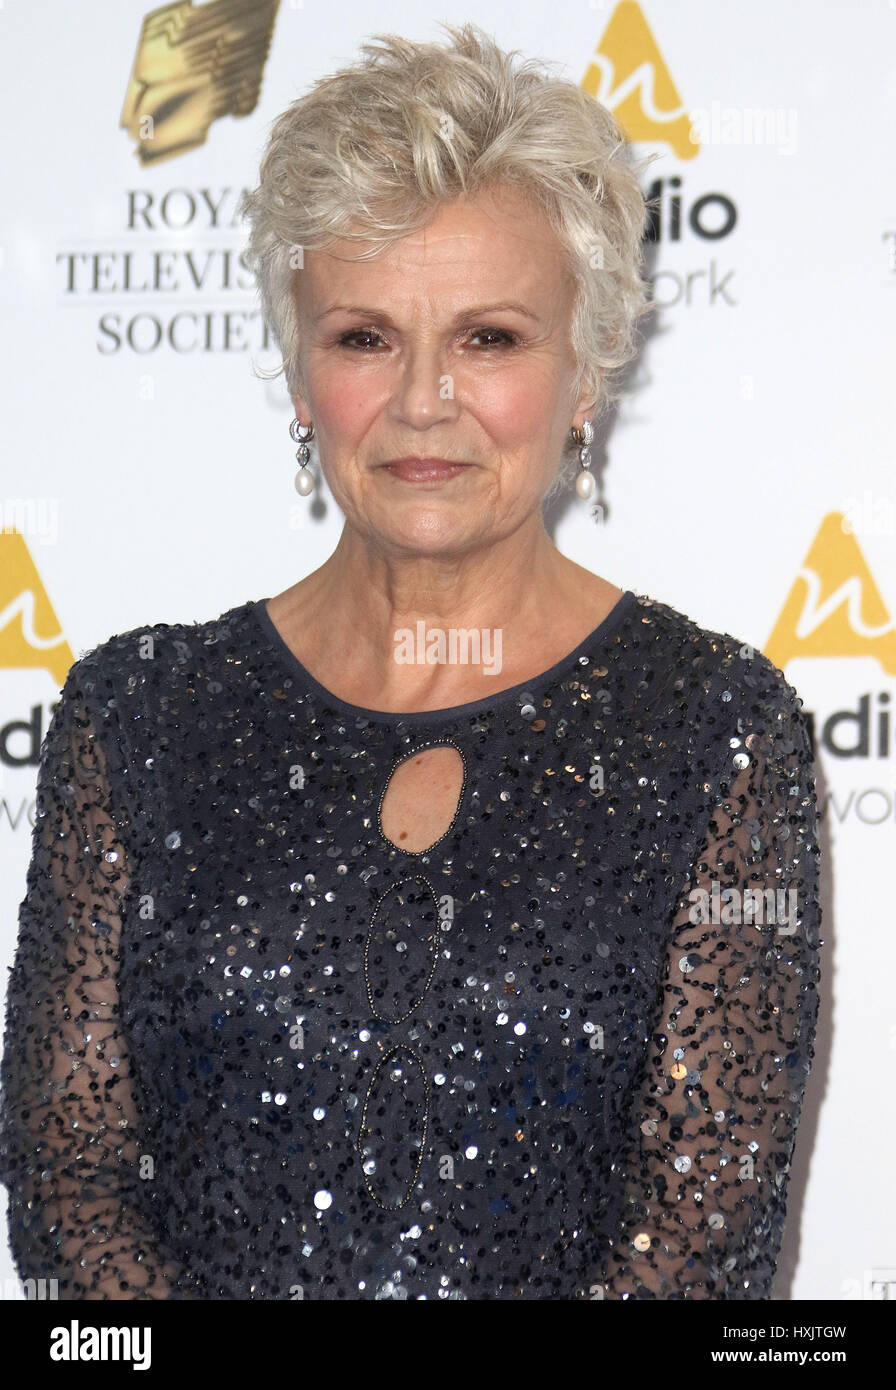 Mar 21, 2017 - Julie Walters assistant à Royal Television Society Awards 2017, l'hôtel Grosvenor House Photo Stock